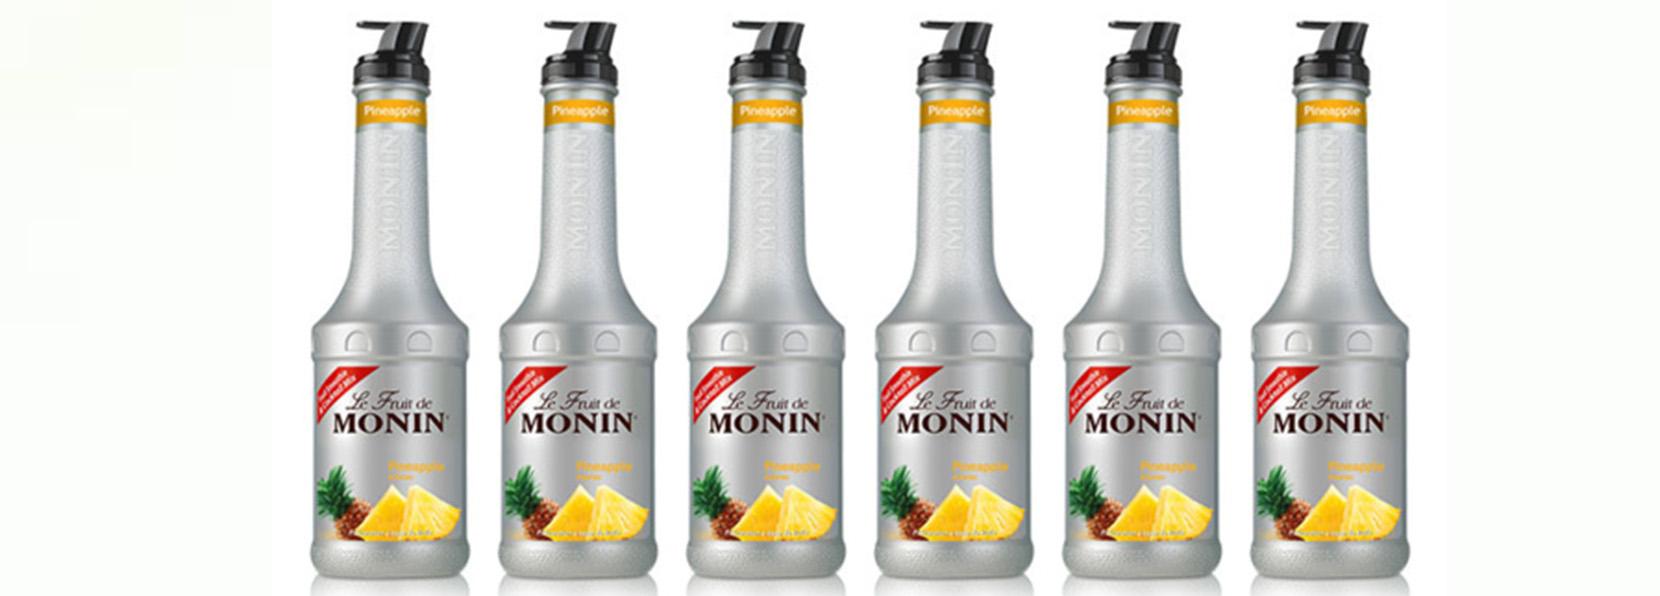 Fruit de MONIN Ananas disponible sur www.moninshopping.com/